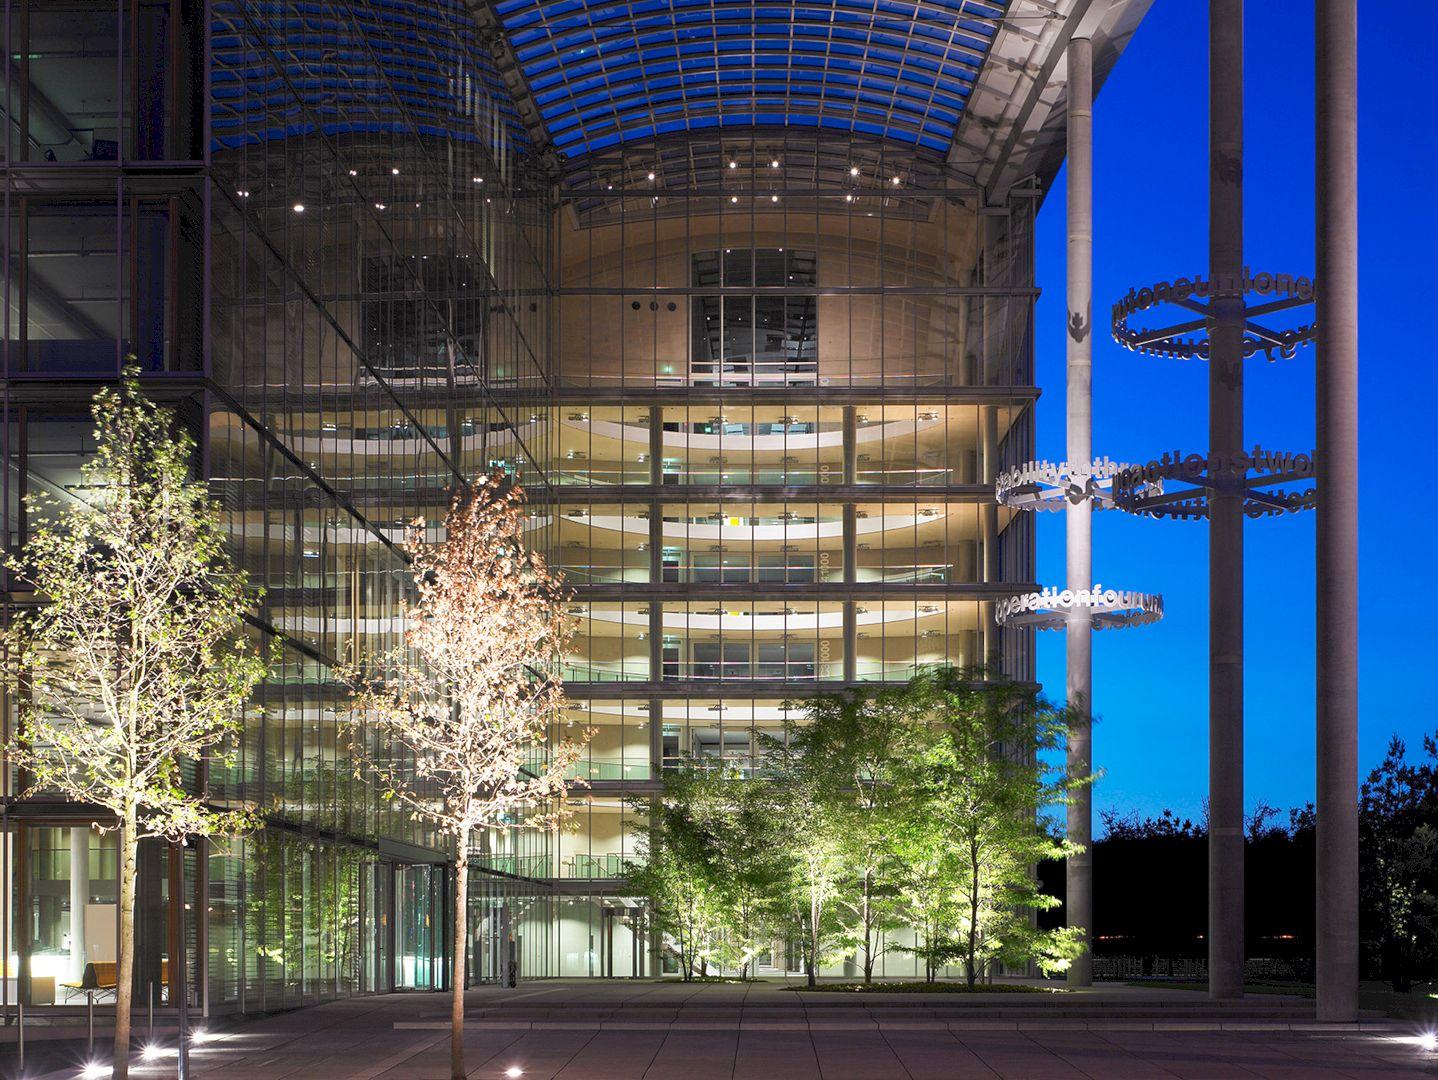 Lufthansa Aviation Center Frankfurt By Ingenhoven Architects 5